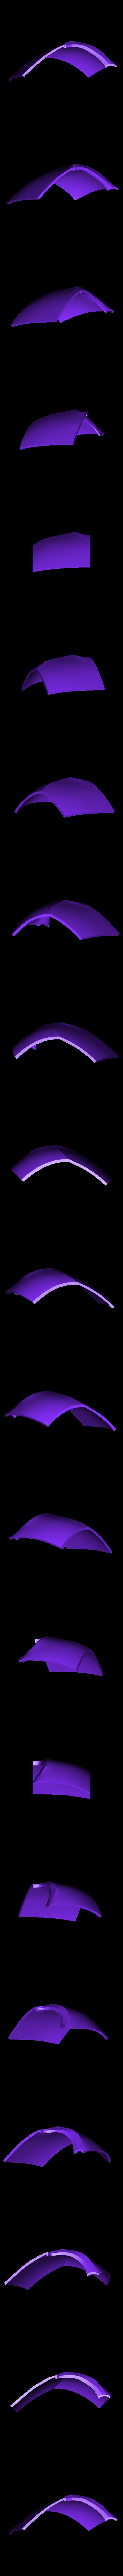 Part_2.stl Download free STL file Red Hood Helmet (Batman) • 3D printer object, VillainousPropShop